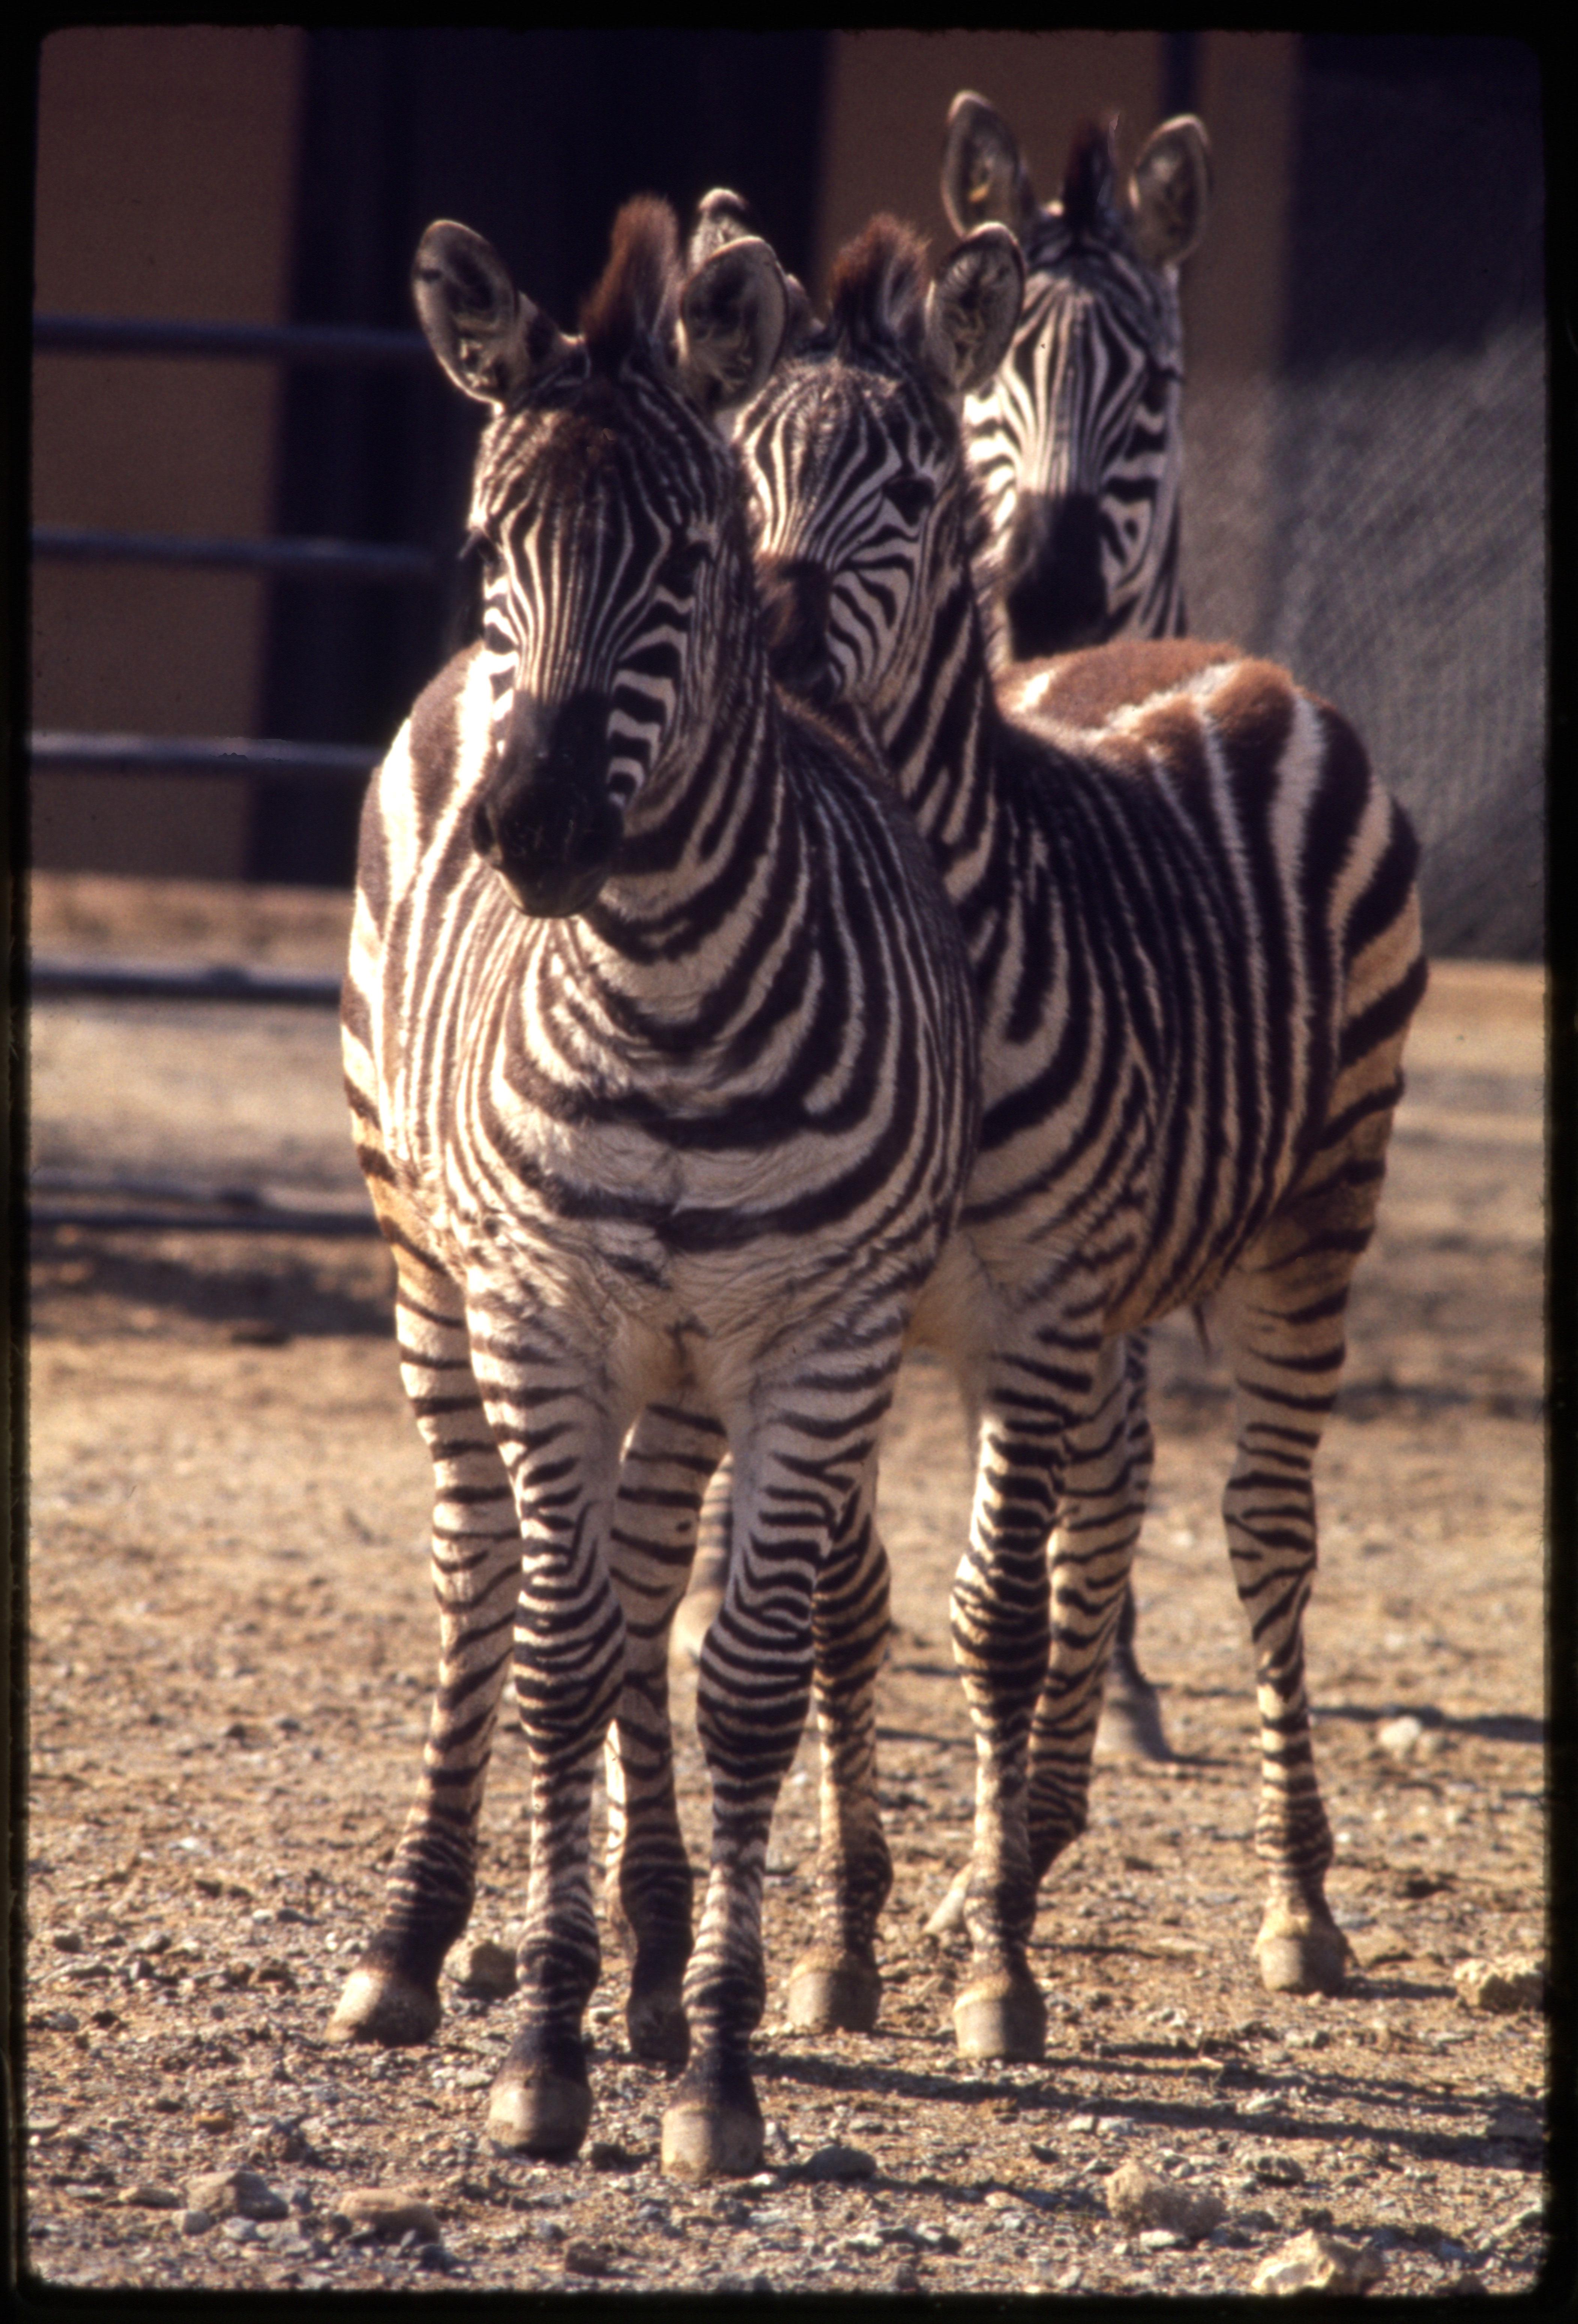 Grant's Zebras at National Zoological Park